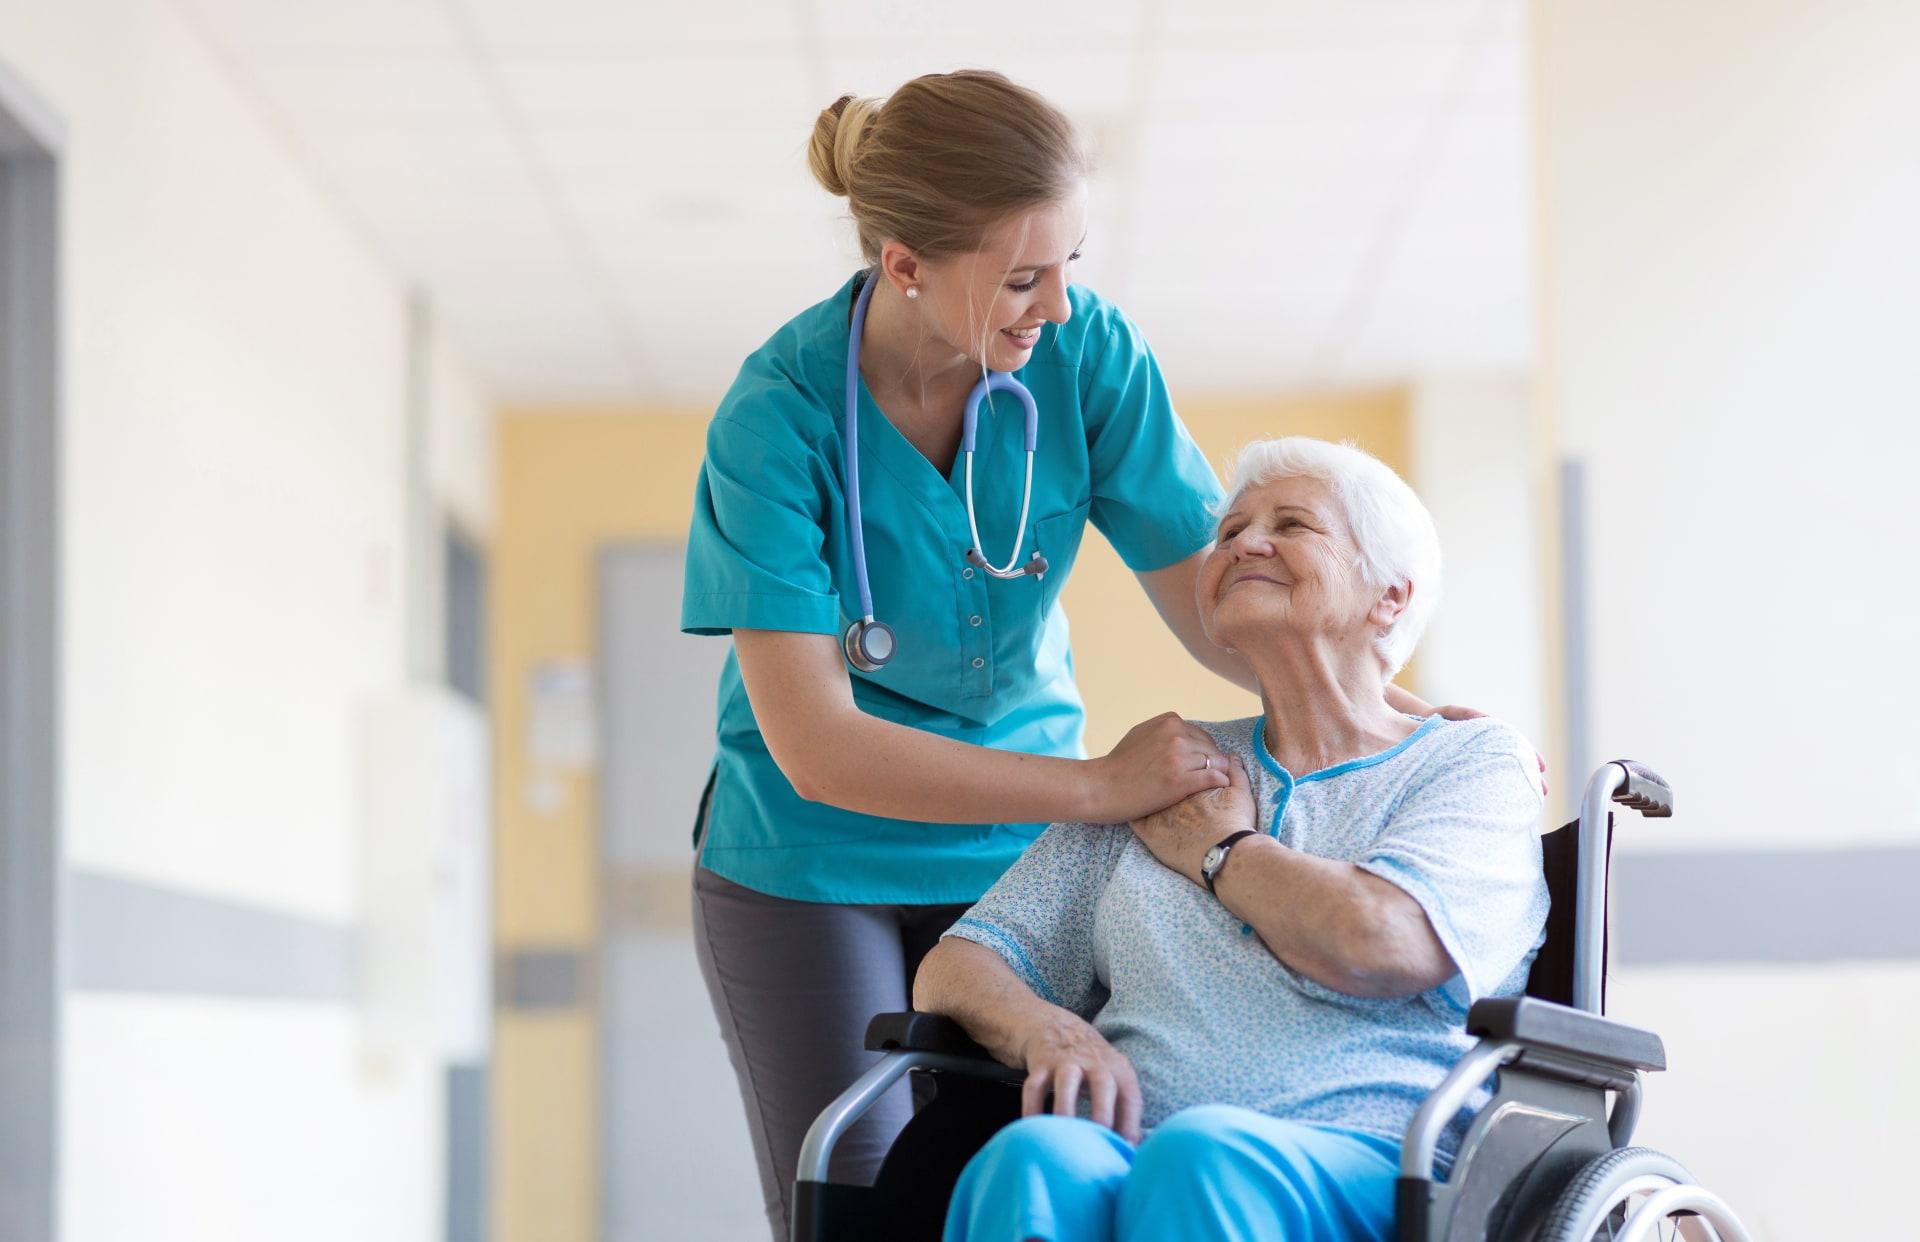 Healthcare Support Worker